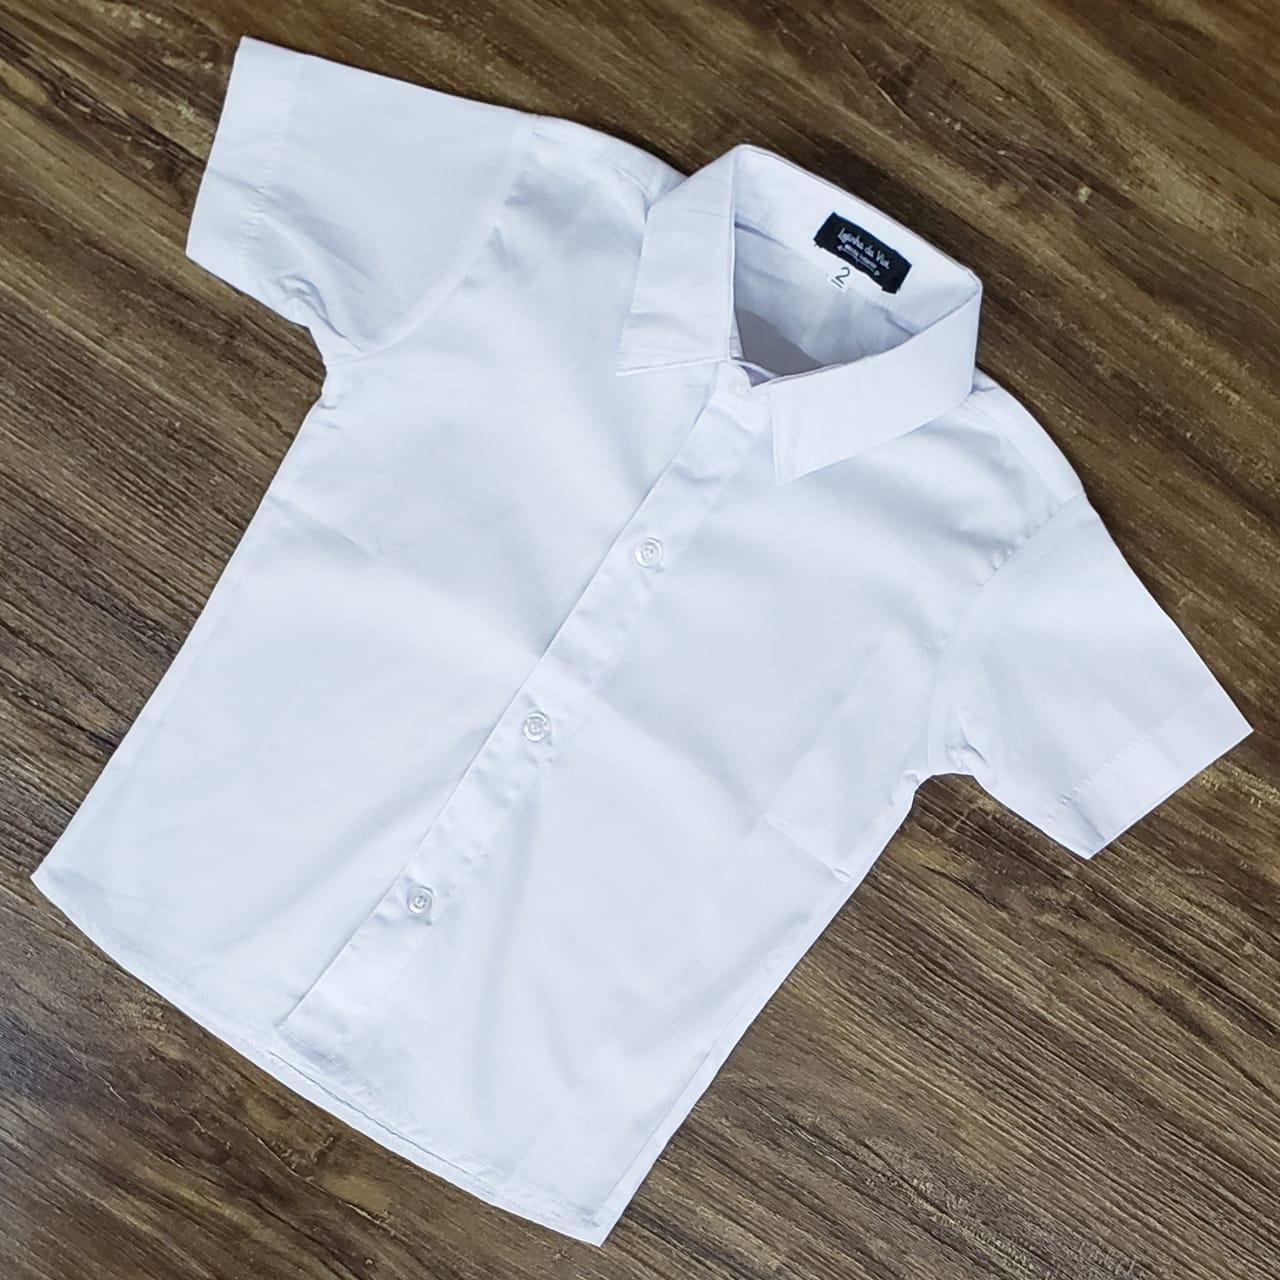 Camisa Social Branca Manga Curta